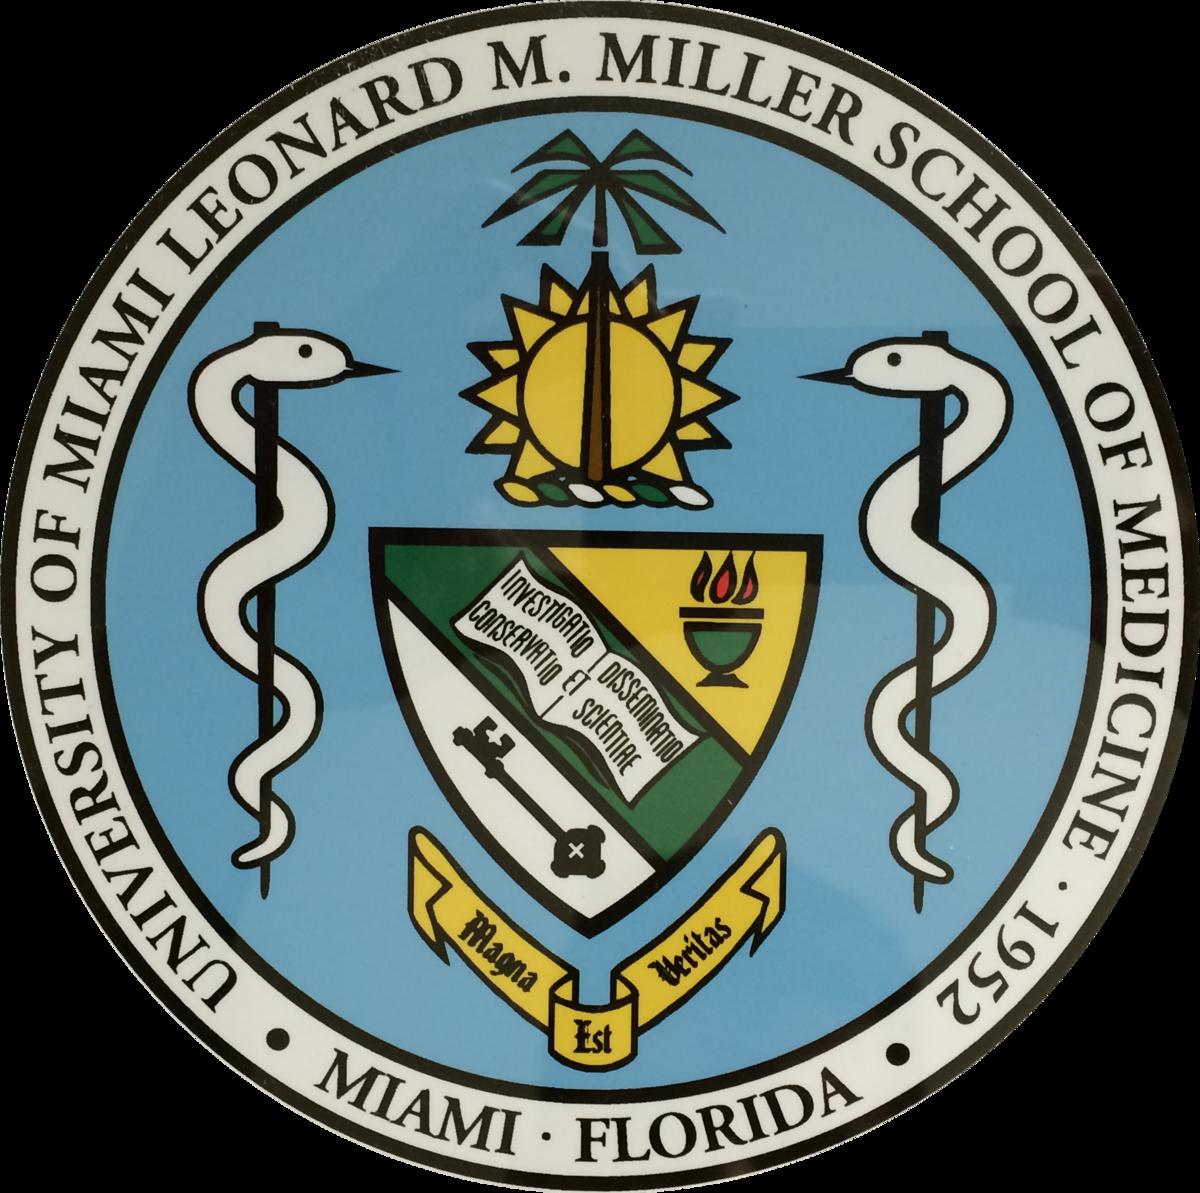 Leonard M  Miller School of Medicine - Wikipedia